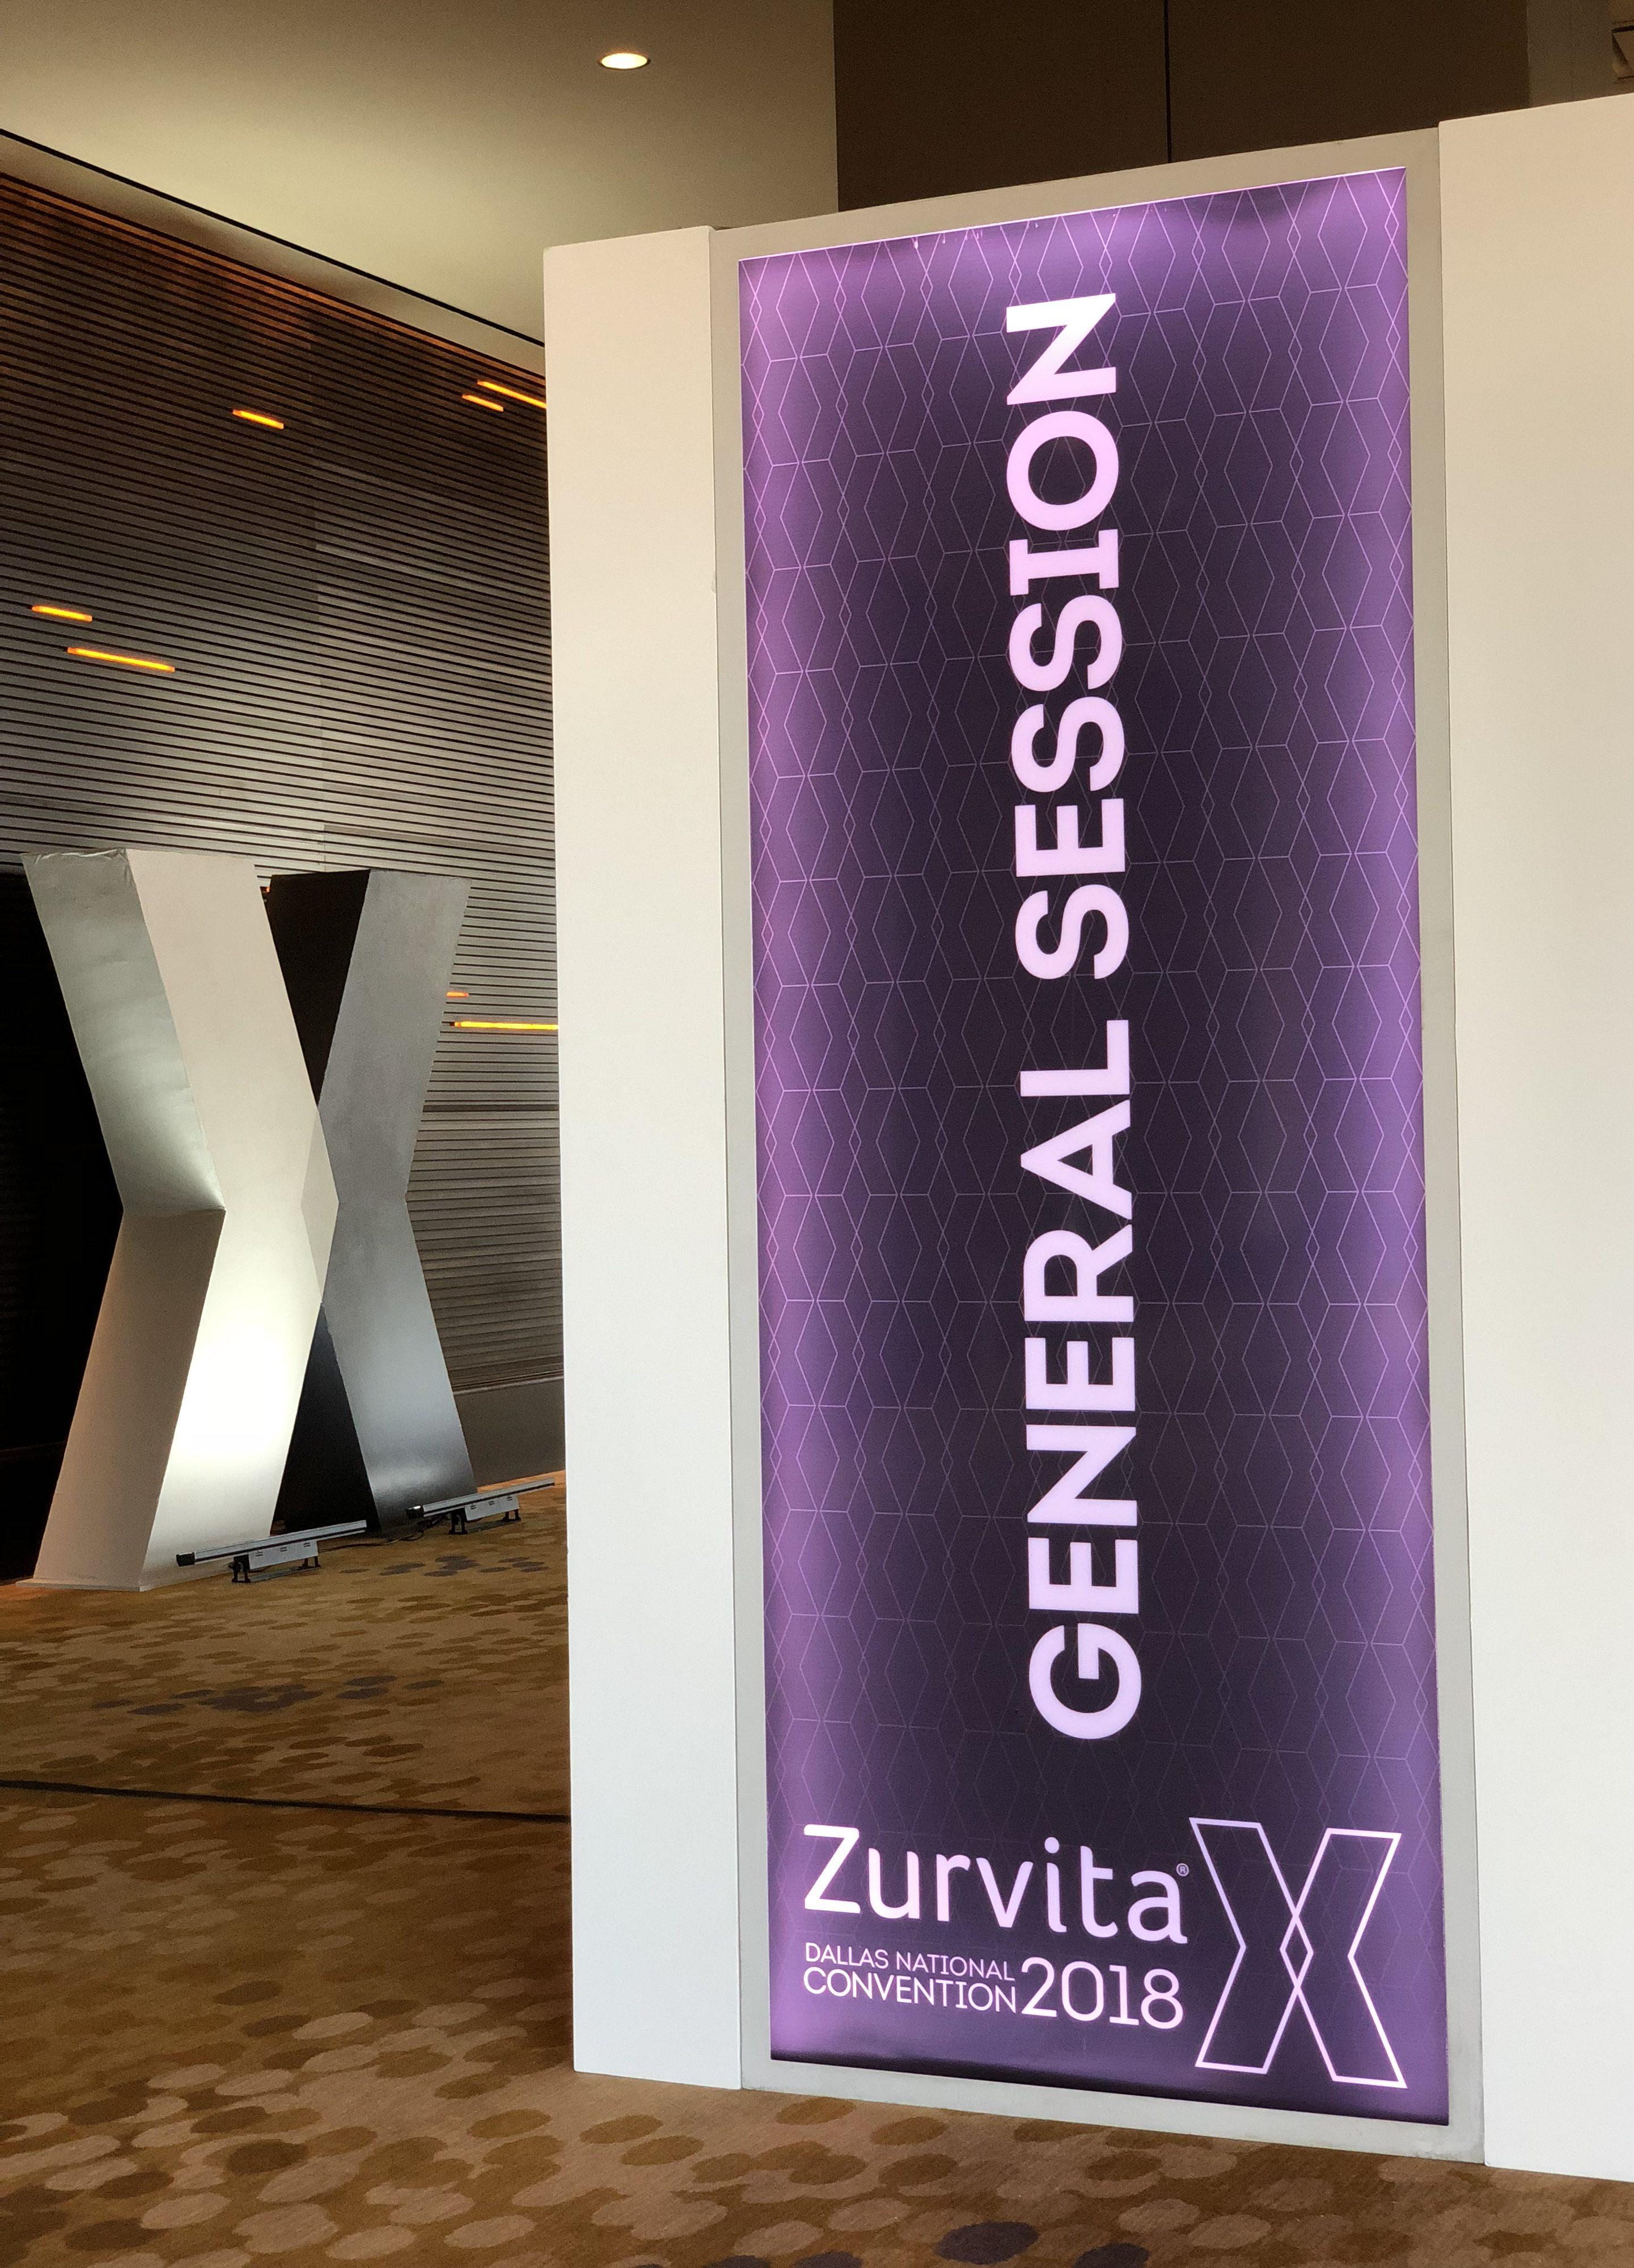 General Session Signage at Zurvita Sale Conference